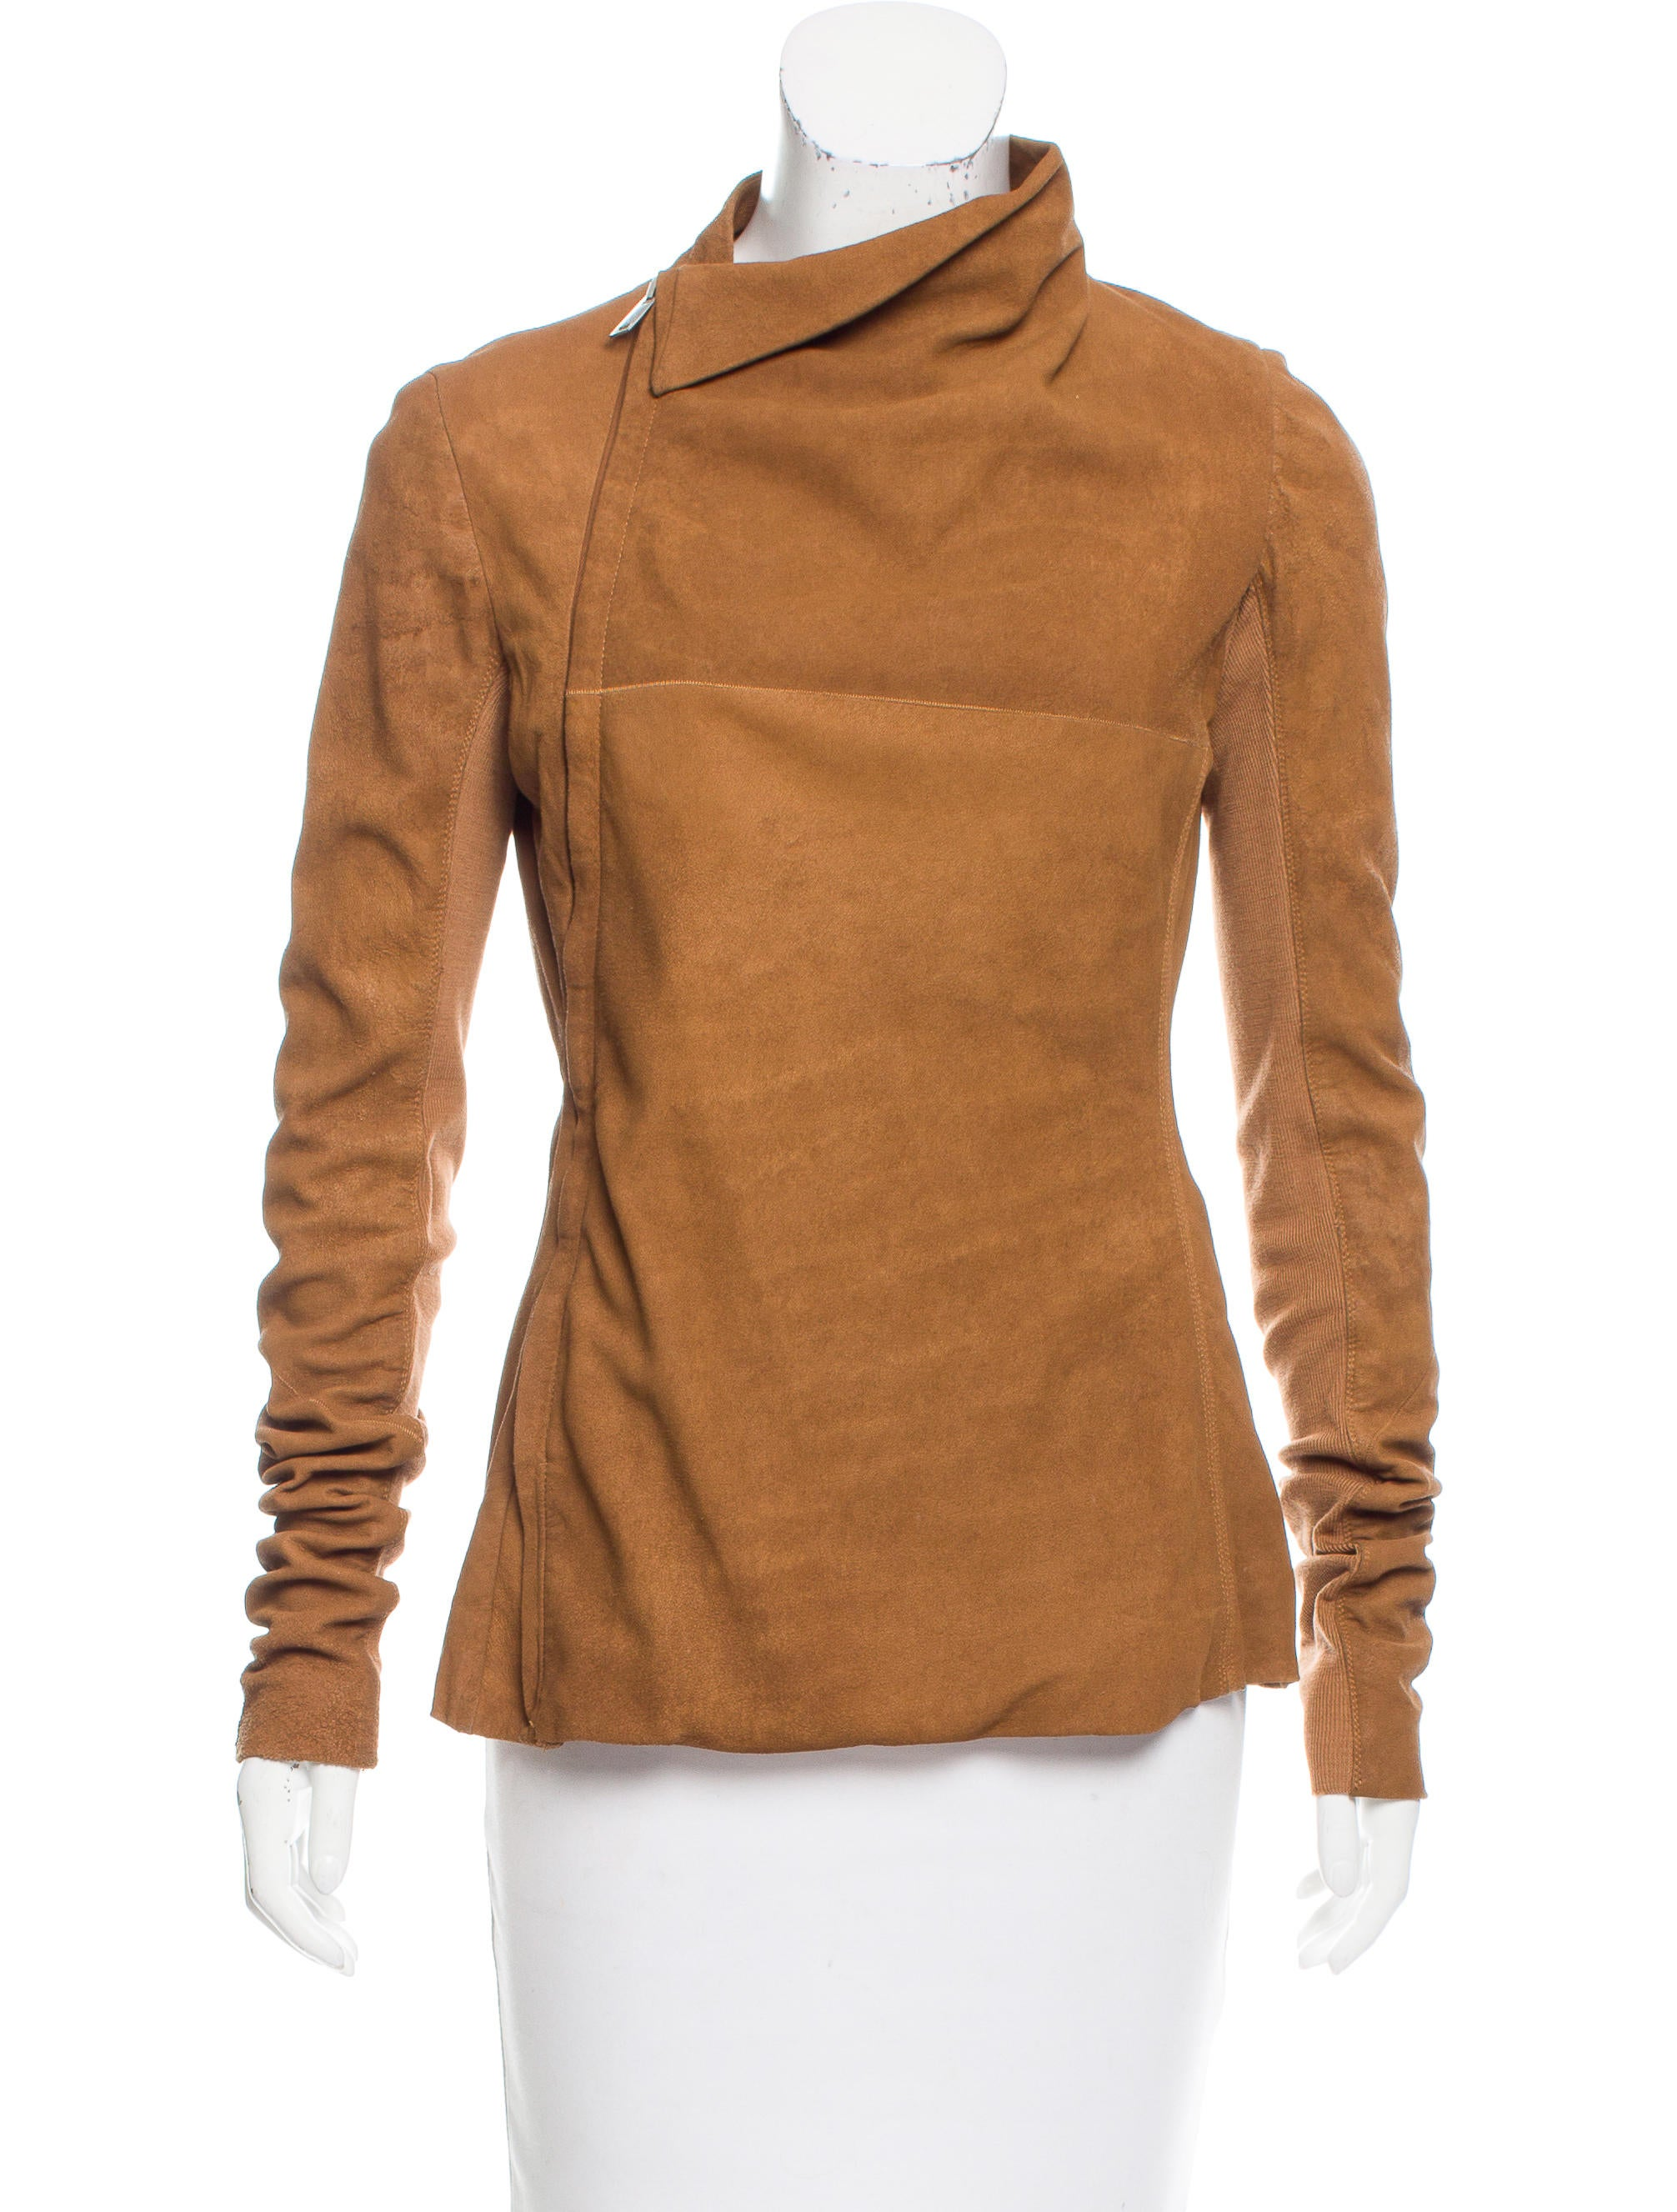 Lightweight leather jackets